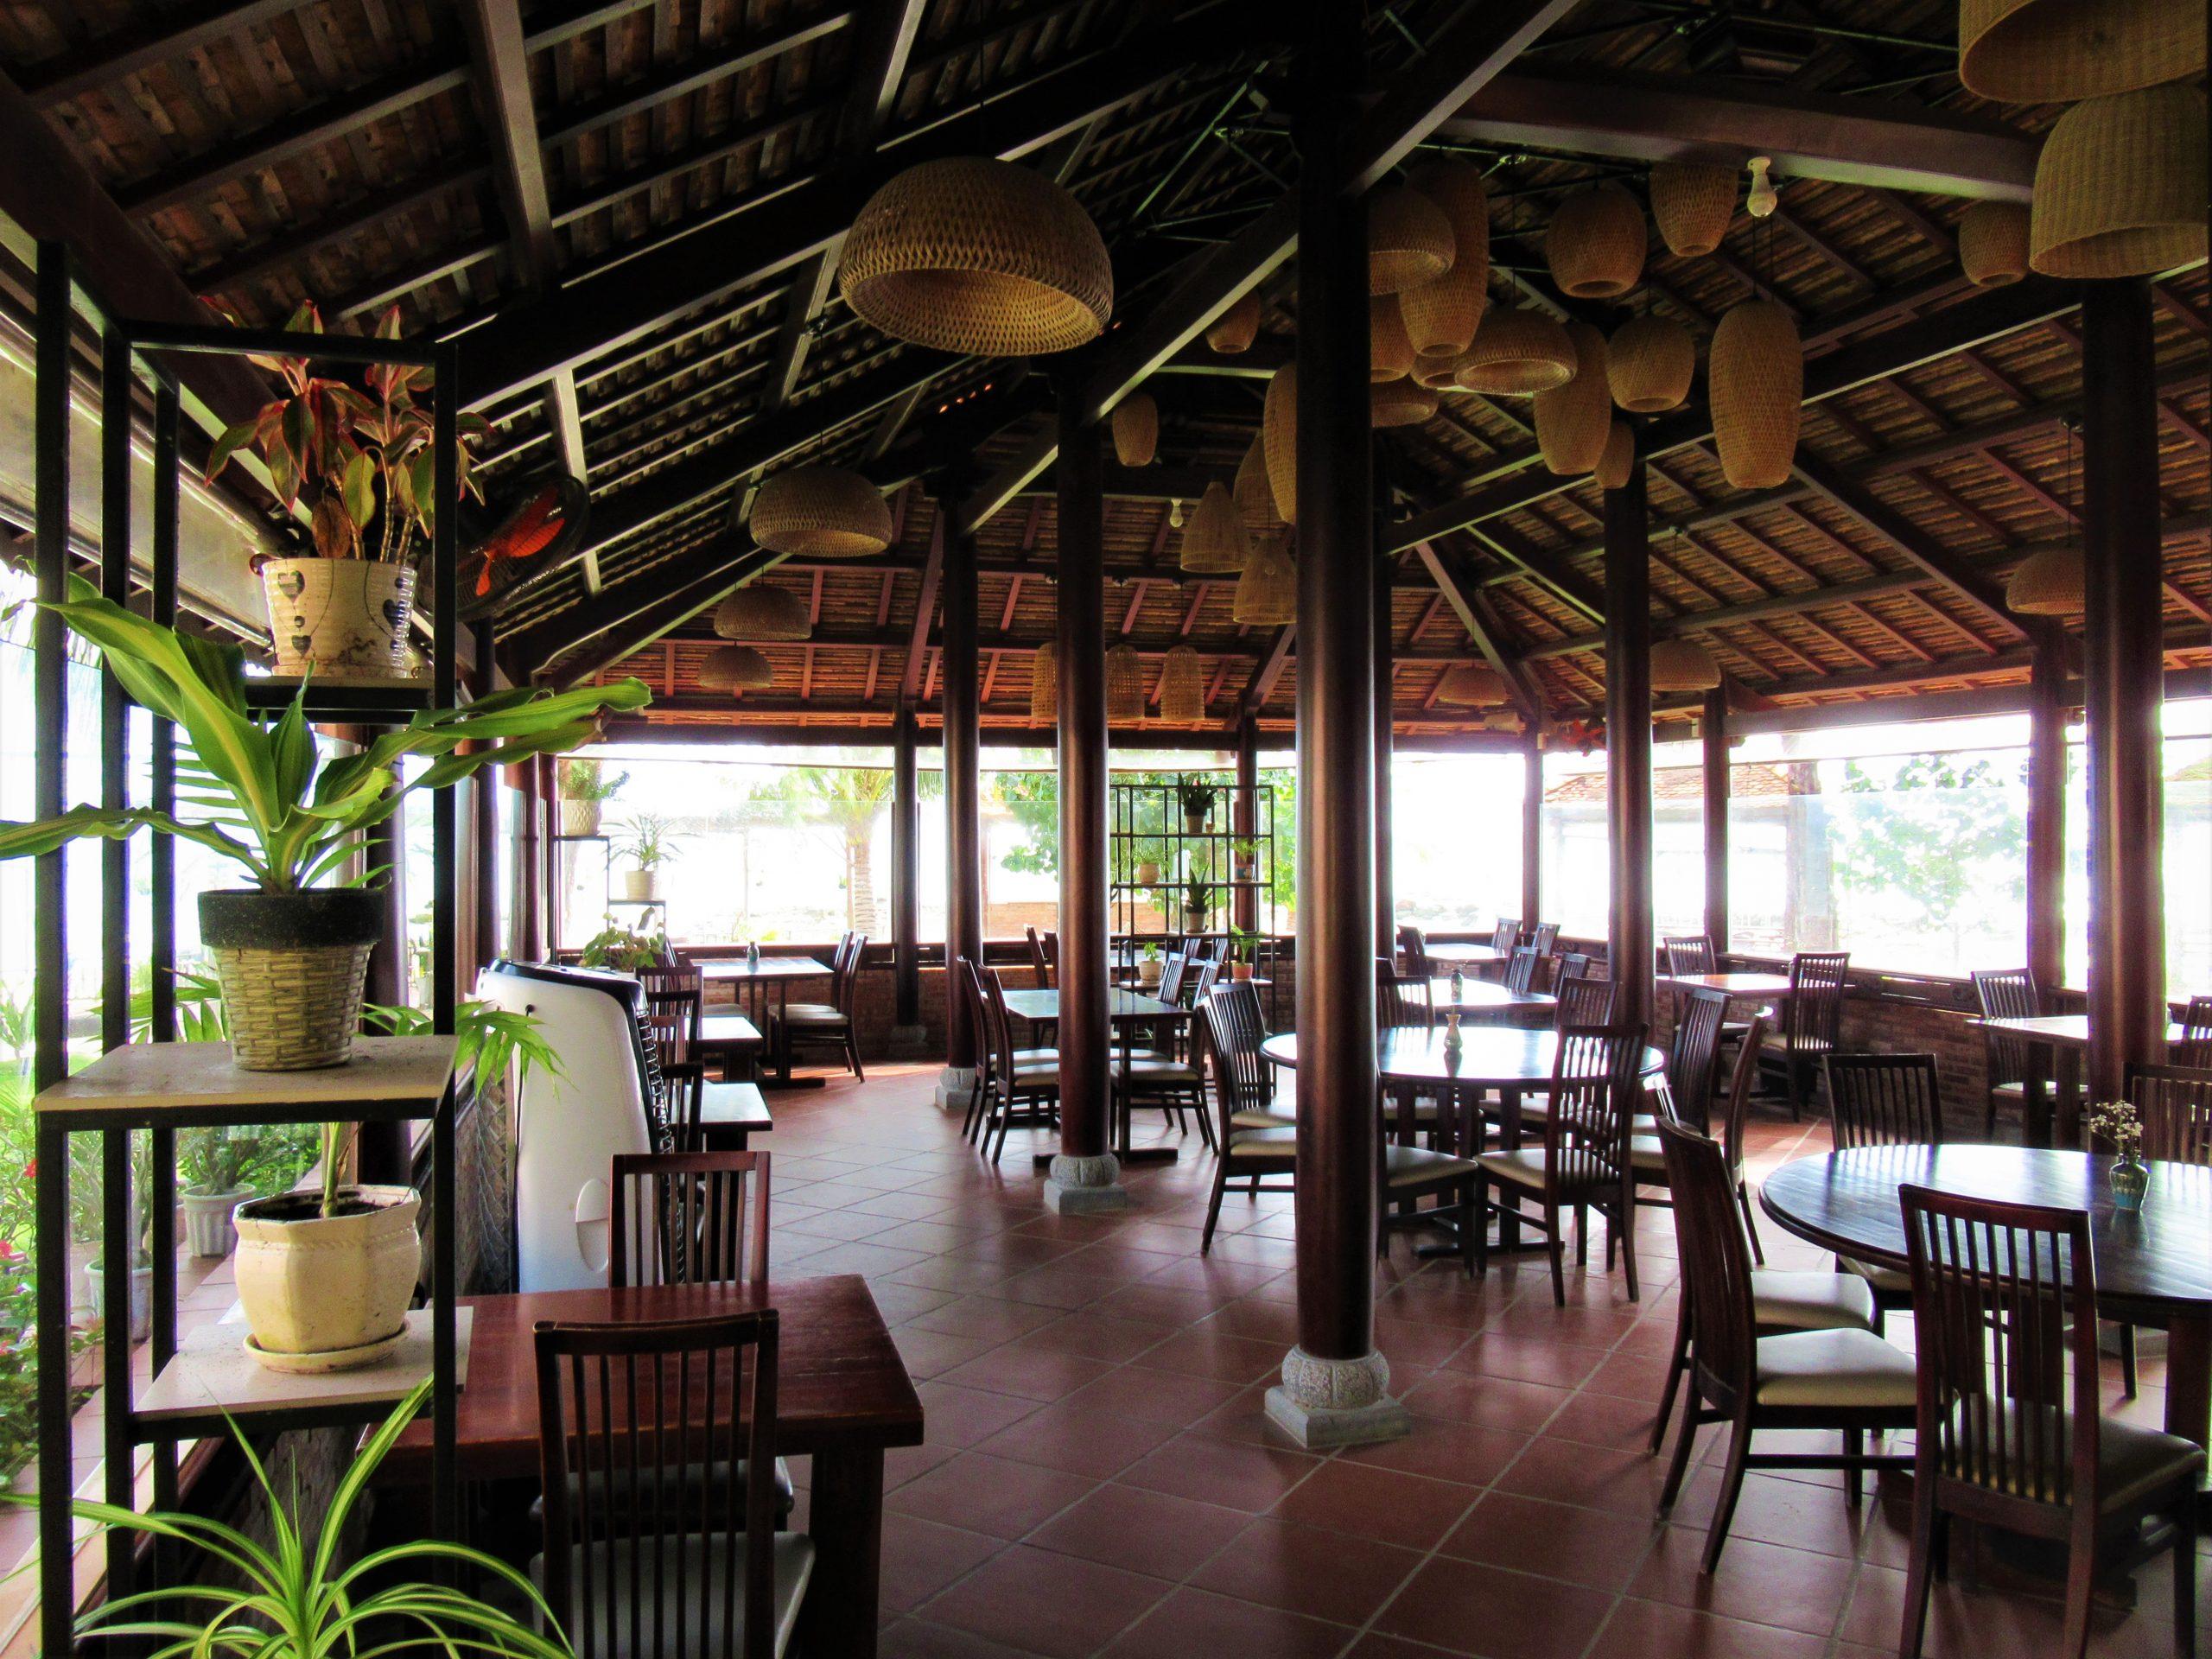 Wooden House restaurant, Gold Coast Resort, Phu Quoc Island, Vietnam